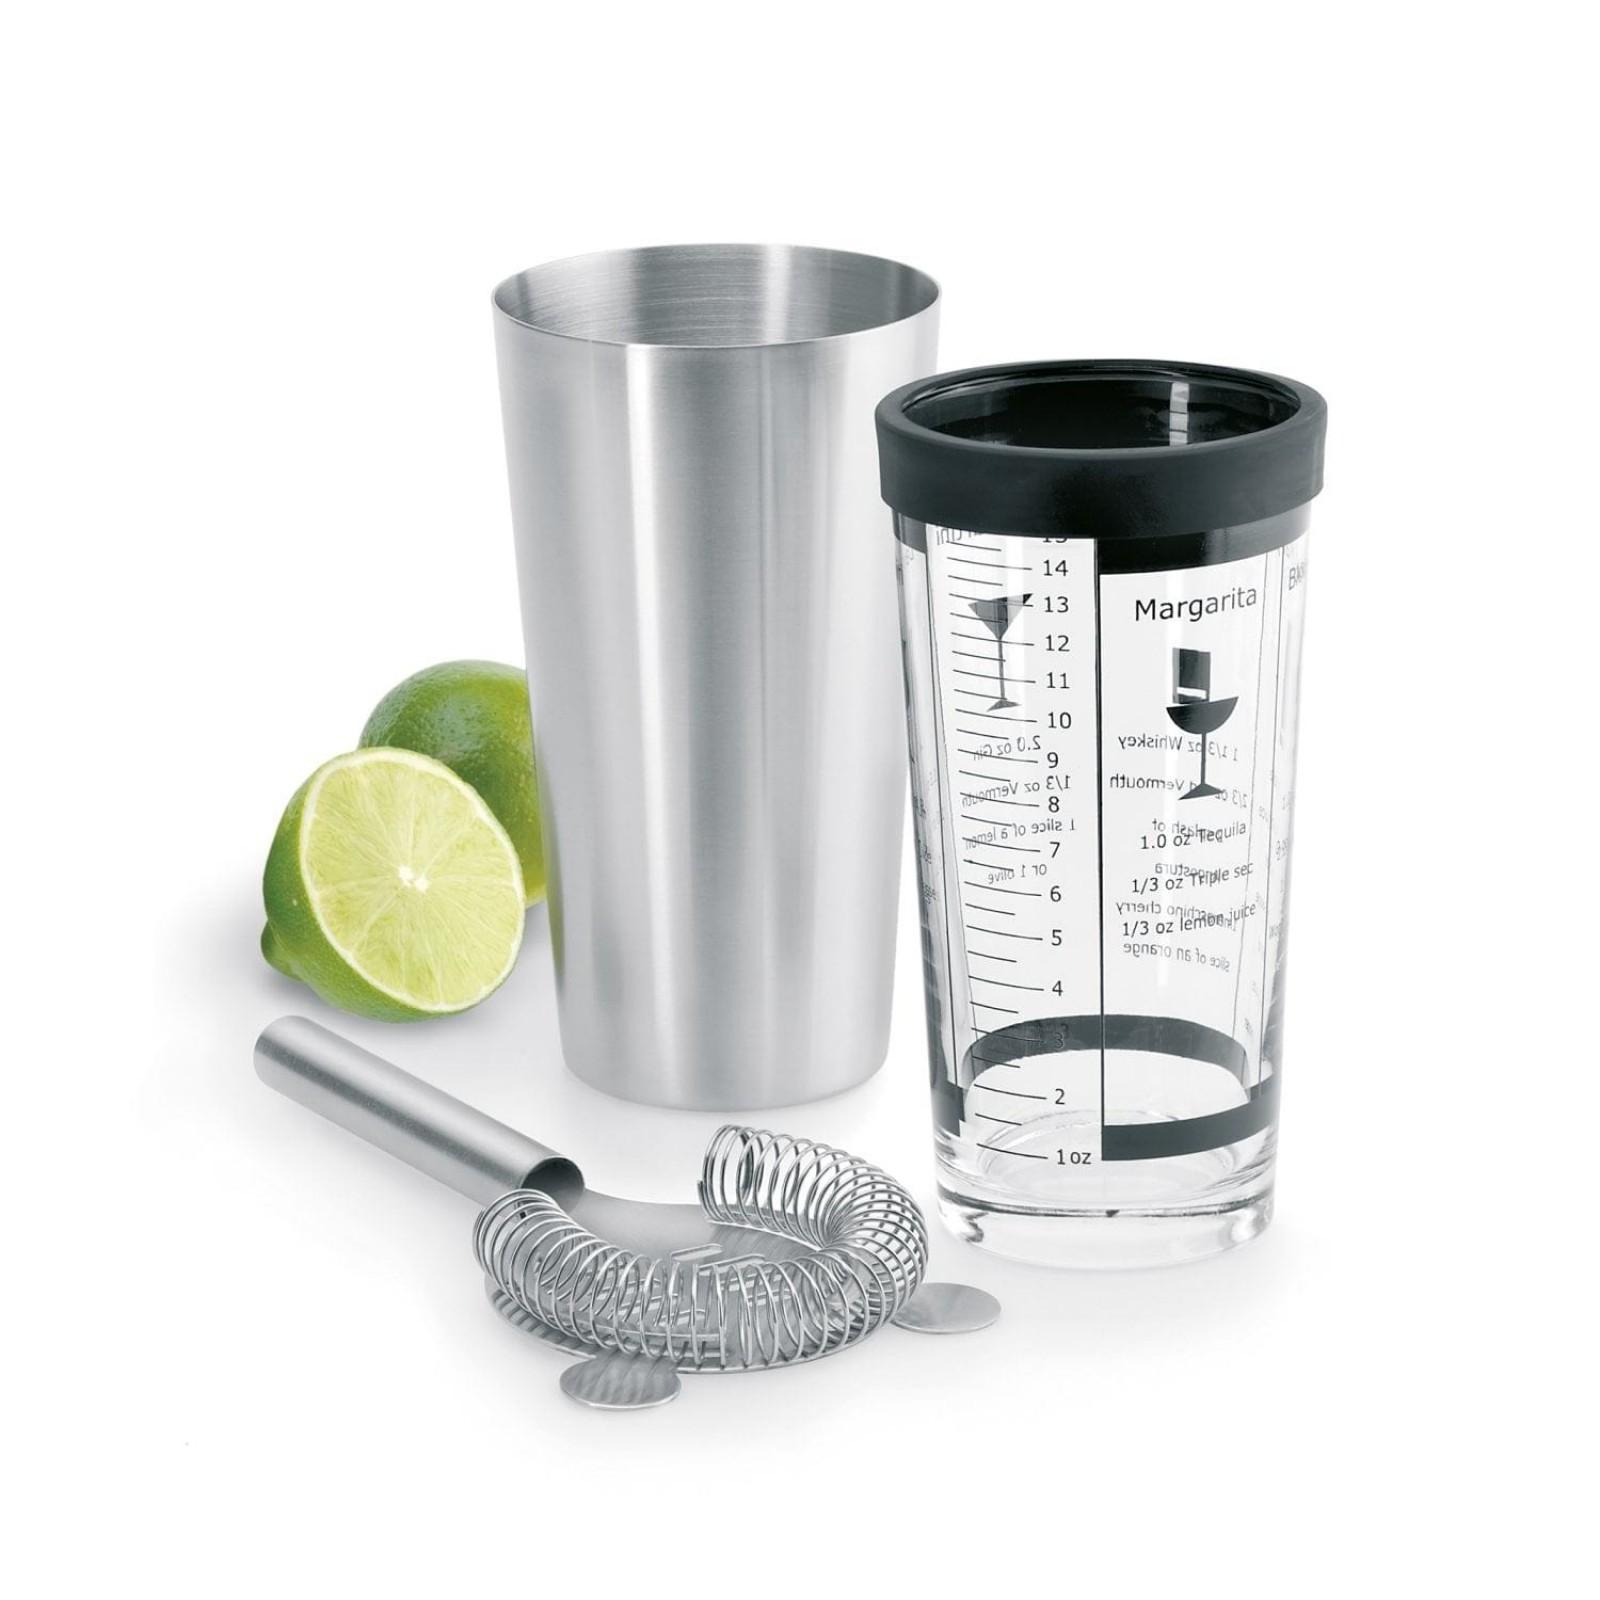 LOUNGE Boston Shaker Σετ για Κοκτέιλ 500ml (Ανοξείδωτο Ατσάλι) - Blomus